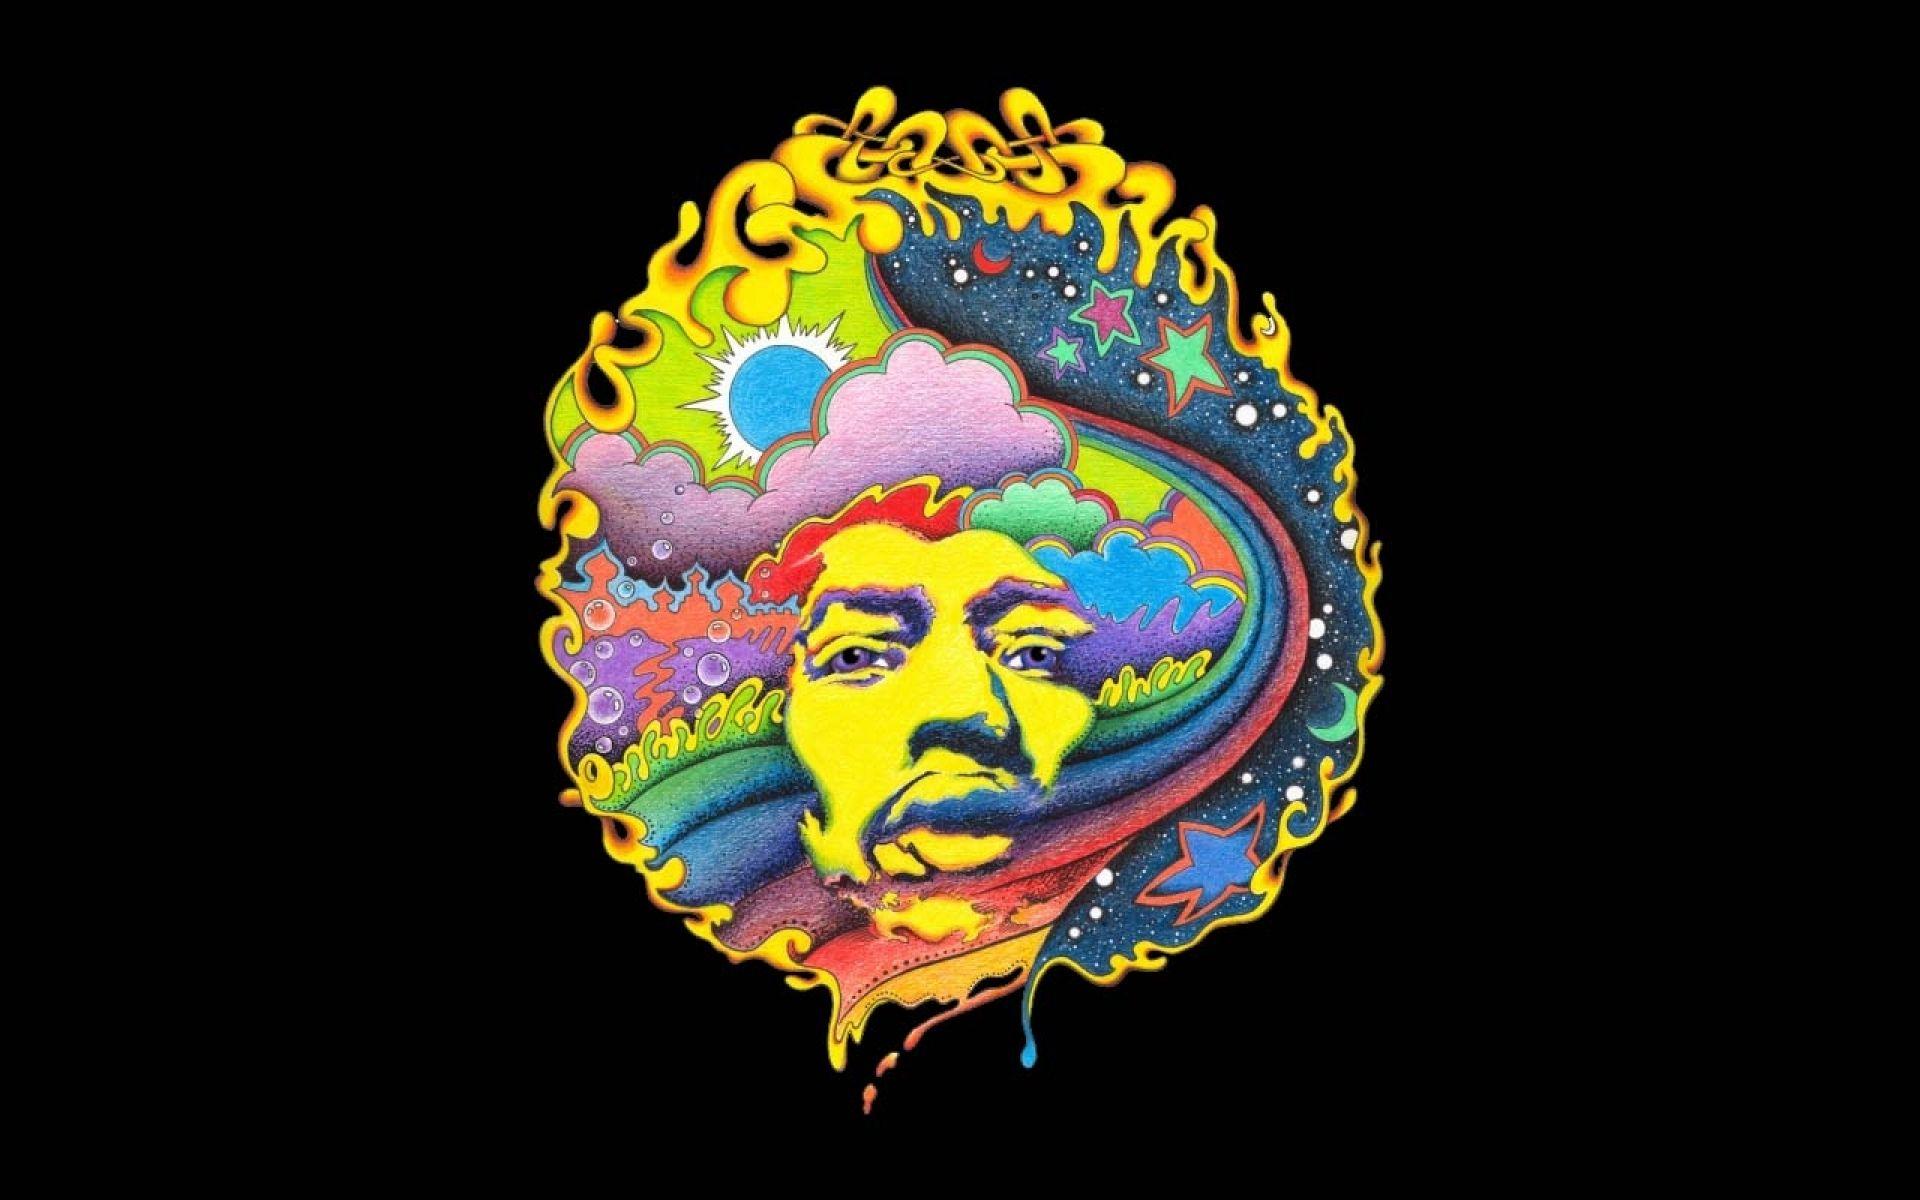 Jimi Hendrix Wallpapers Group 1920×1080 Jimi Hendrix